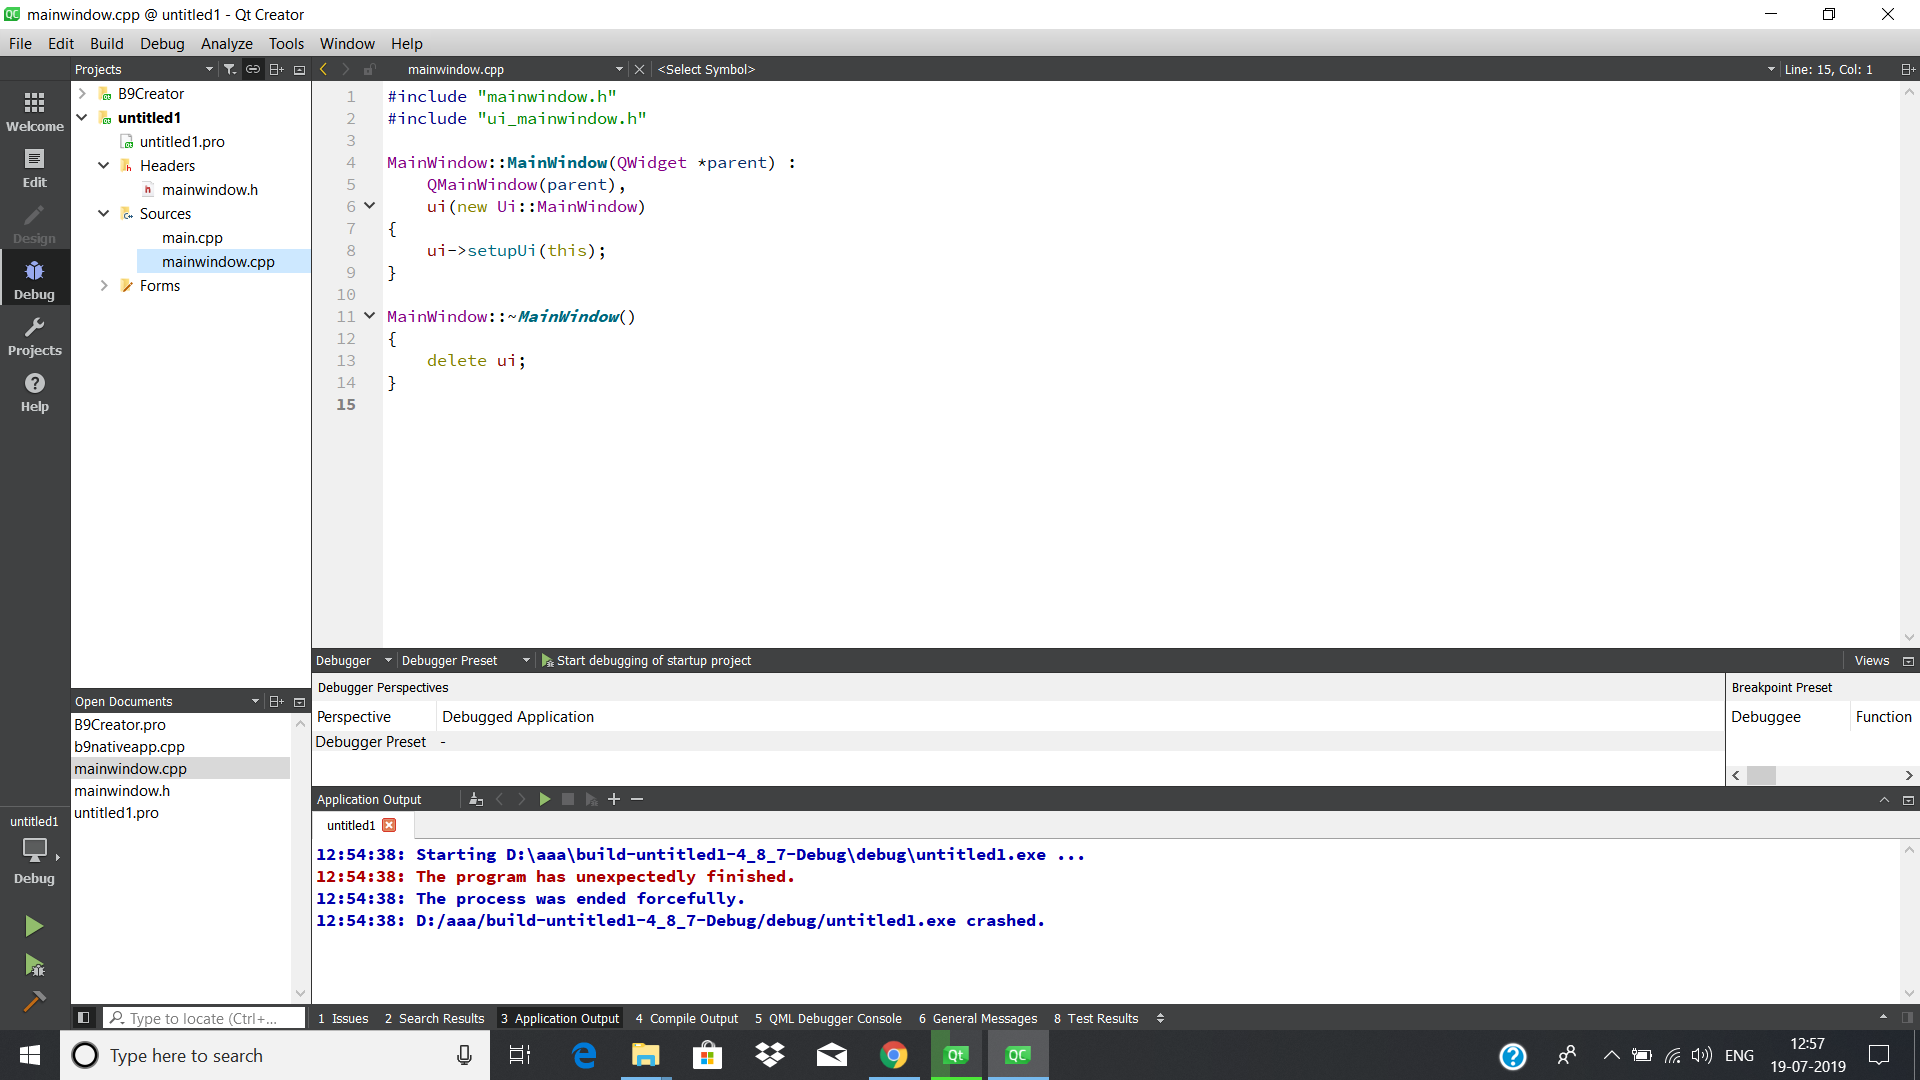 0_1563521332792_Screenshot (1).png